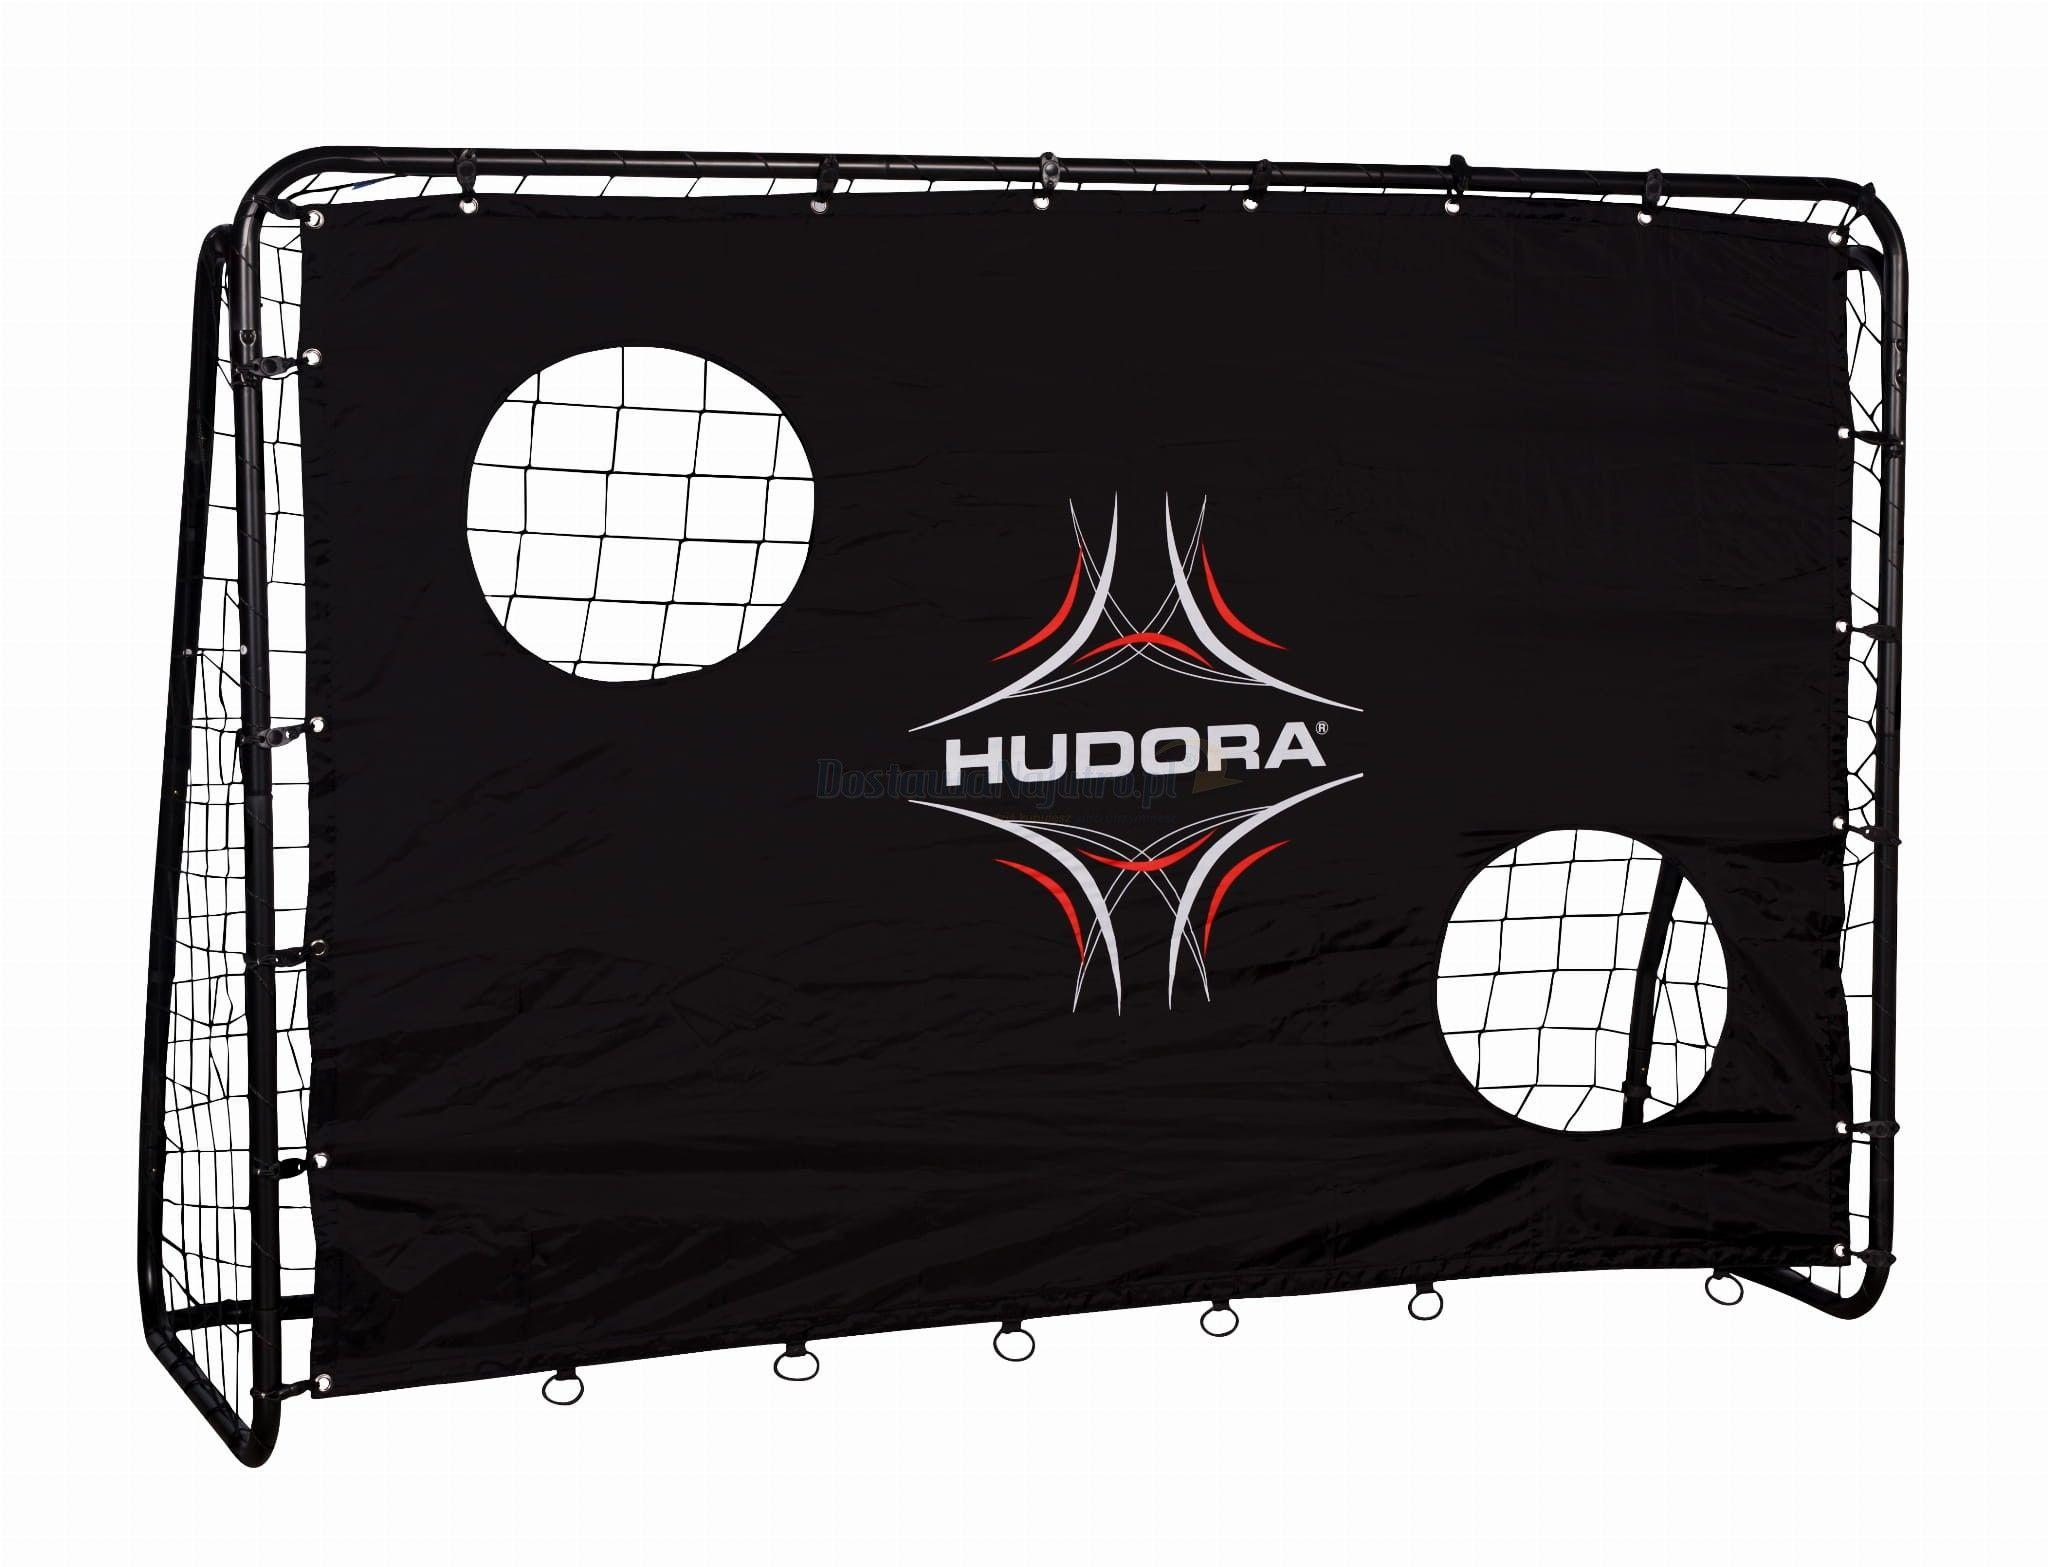 Bramka piłkarska FREEKICK HUDORA + mata 213 x 152 cm